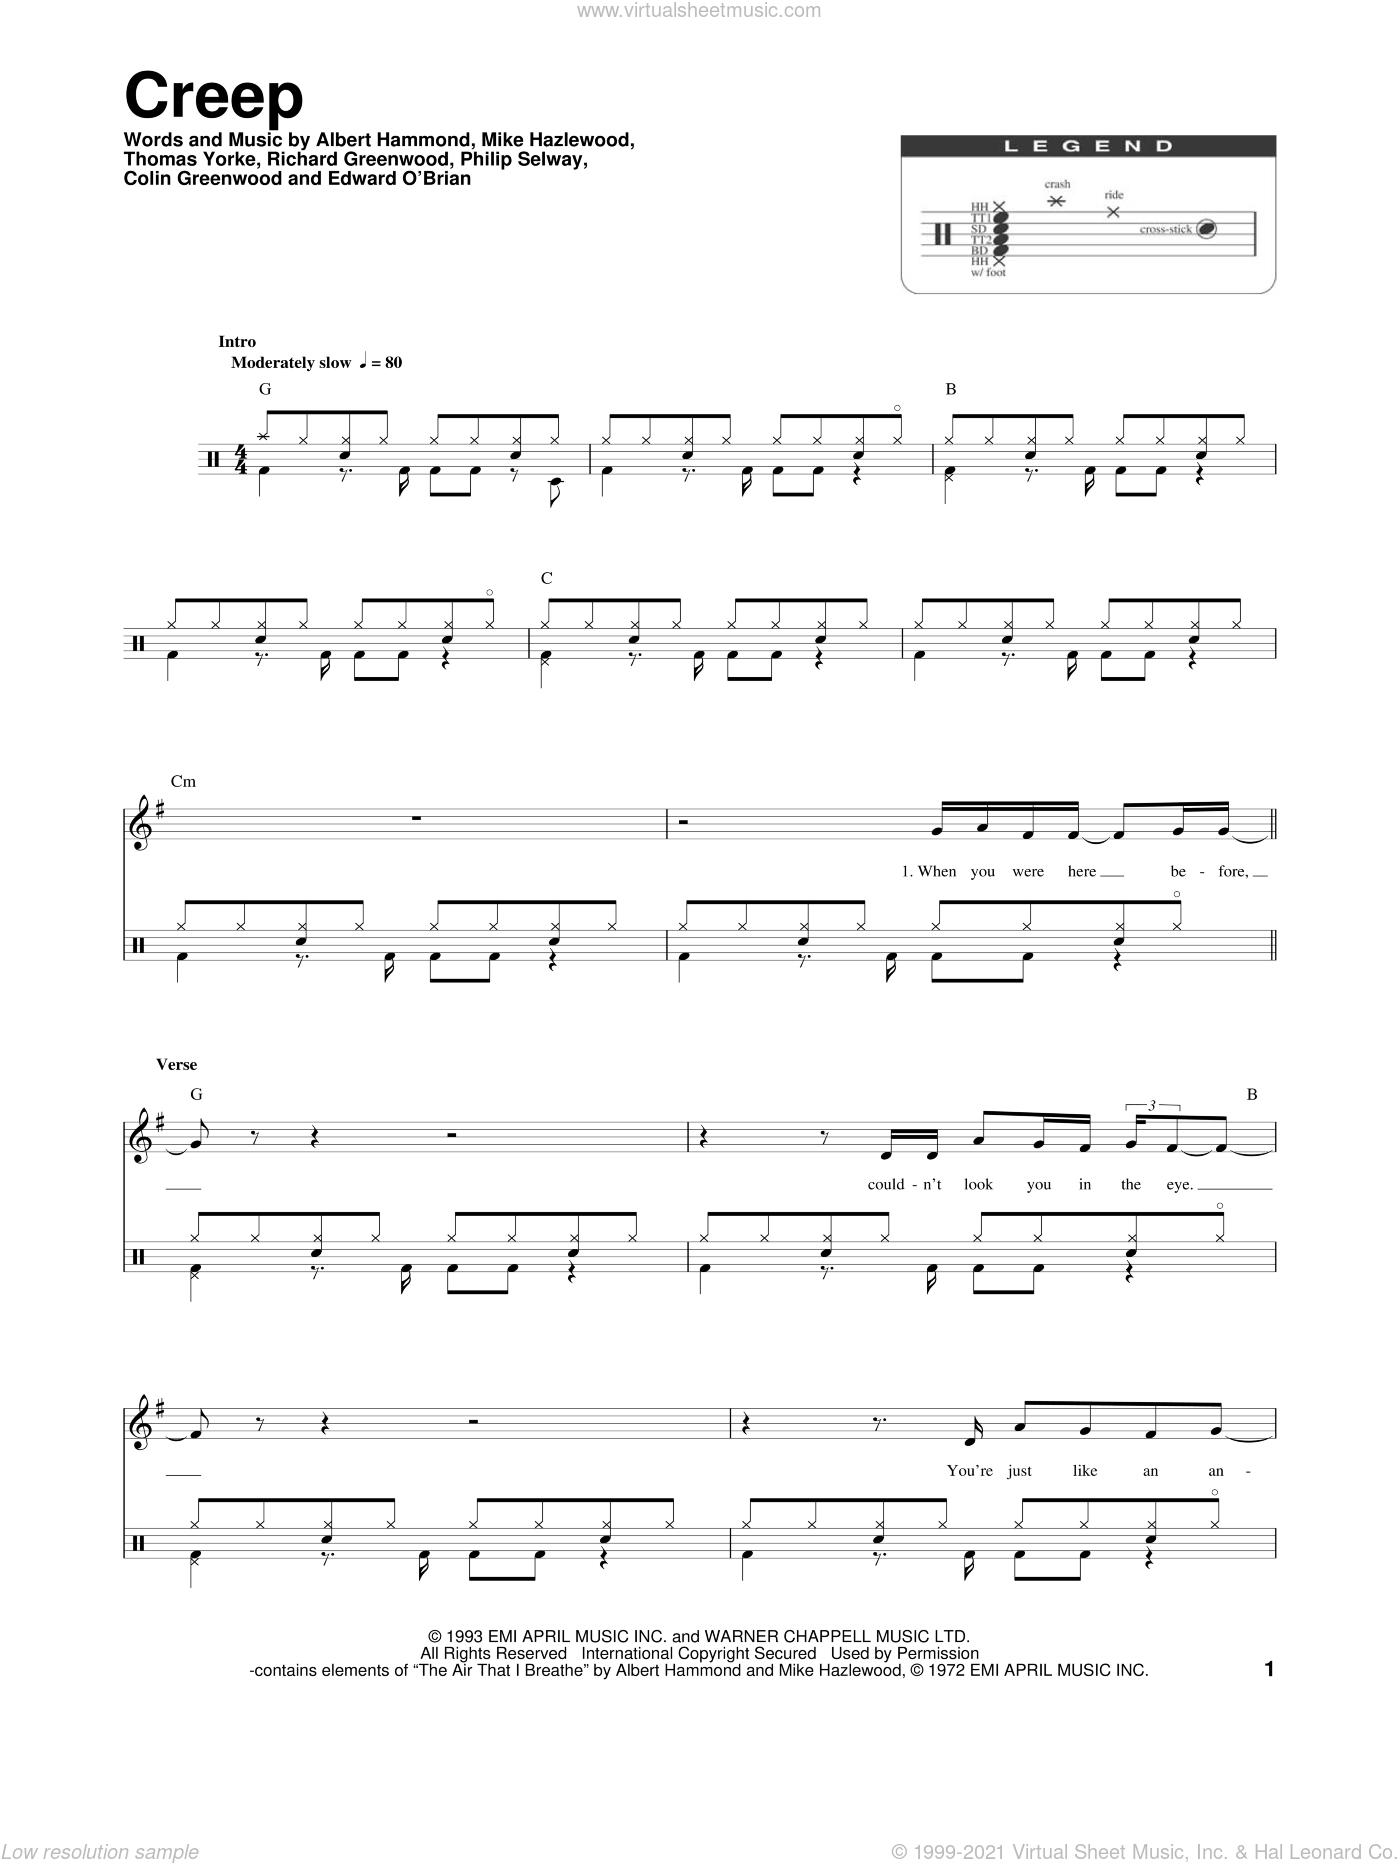 Creep sheet music for drums by Radiohead, Albert Hammond, Colin Greenwood, Jonathan Greenwood, Michael Hazlewood, Philip Selway and Thom Yorke, intermediate skill level